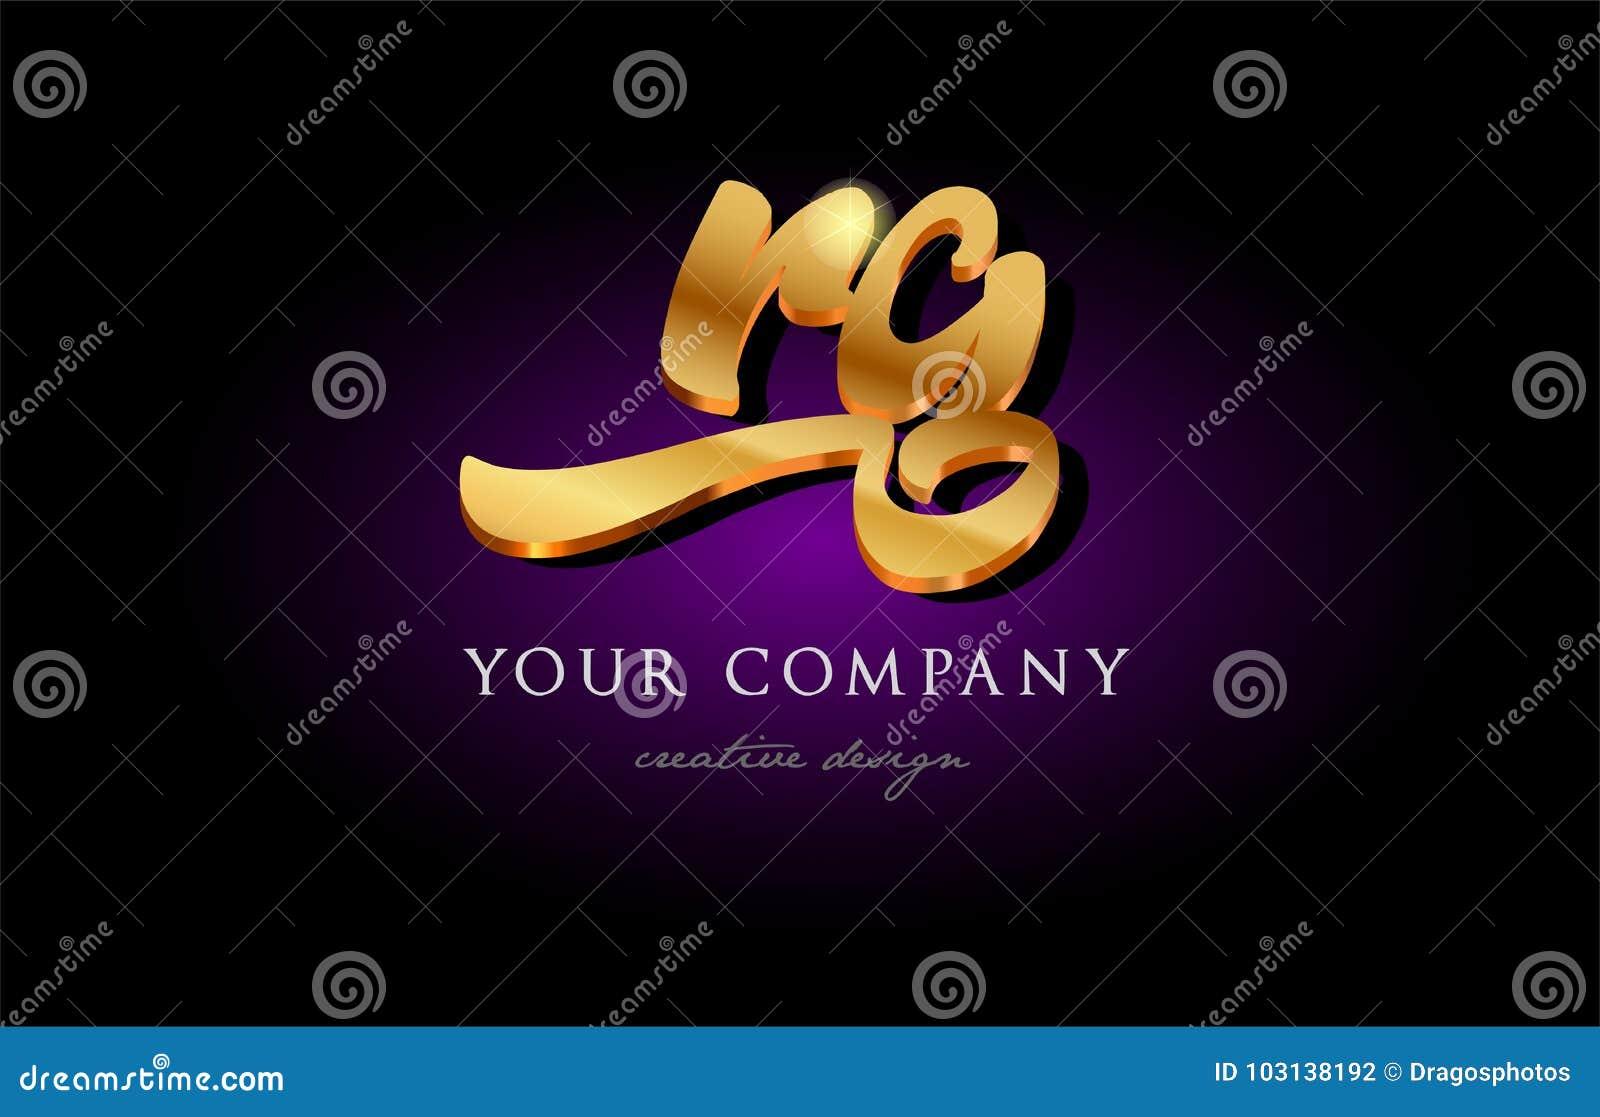 Rg R G 3d Gold Golden Alphabet Letter Metal Logo Icon Design Ha